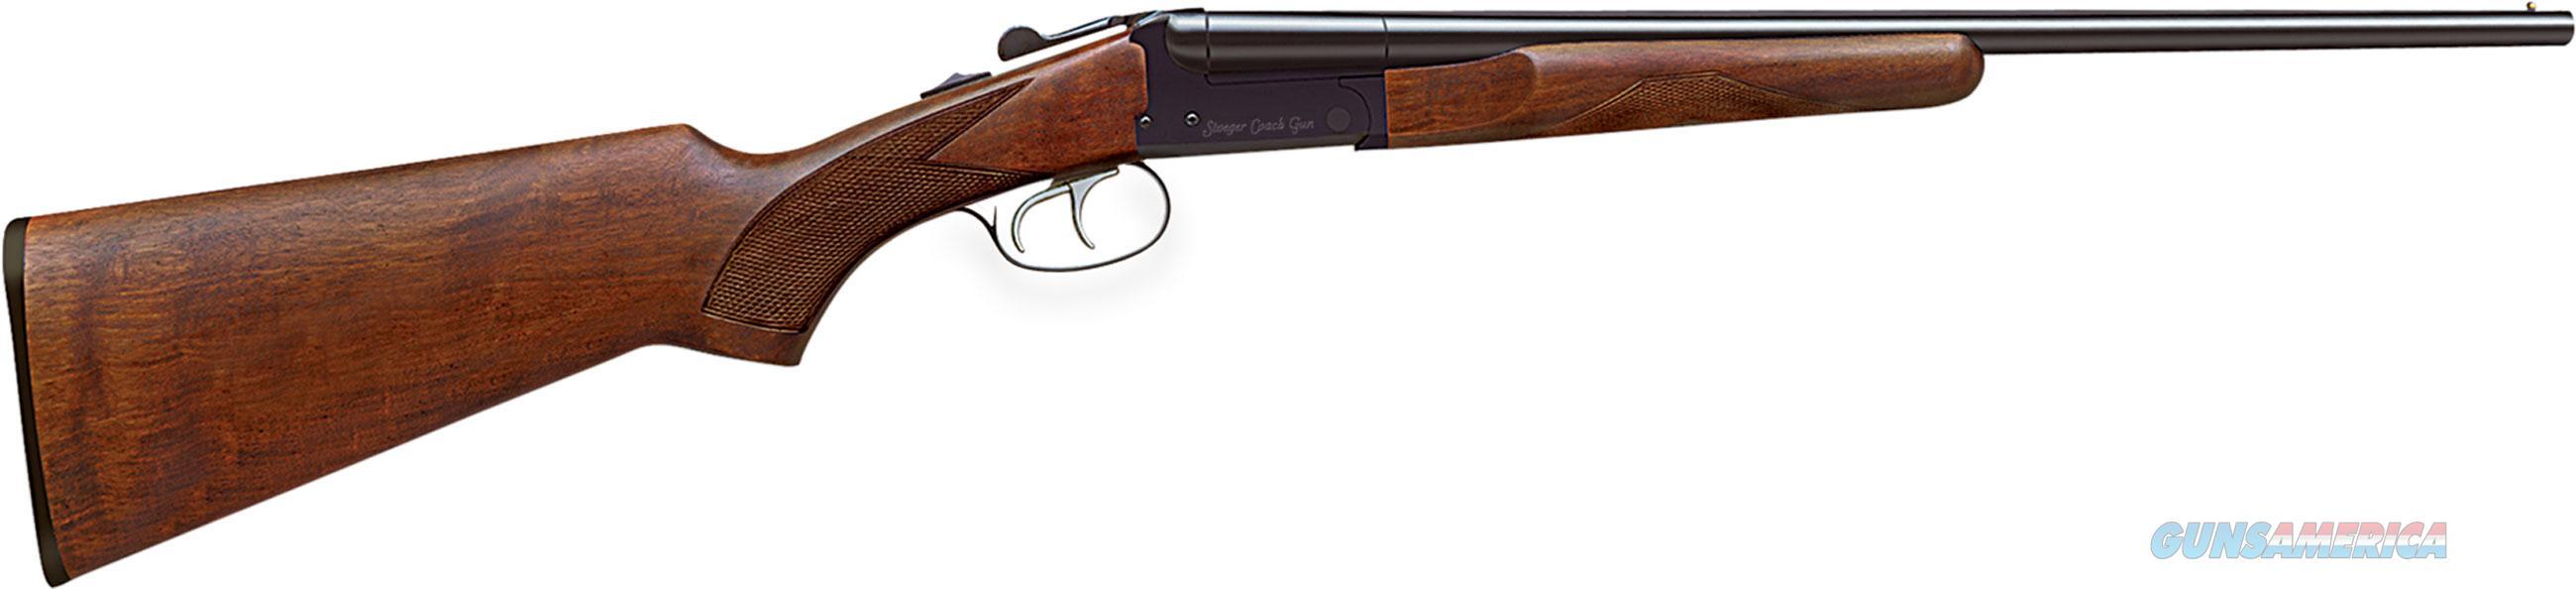 "Stoeger Uplander Youth Double Trigger, 31130, 20 Gauge, 3"", 22"" Barrel, NIB  Guns > Shotguns > Stoeger Shotguns"